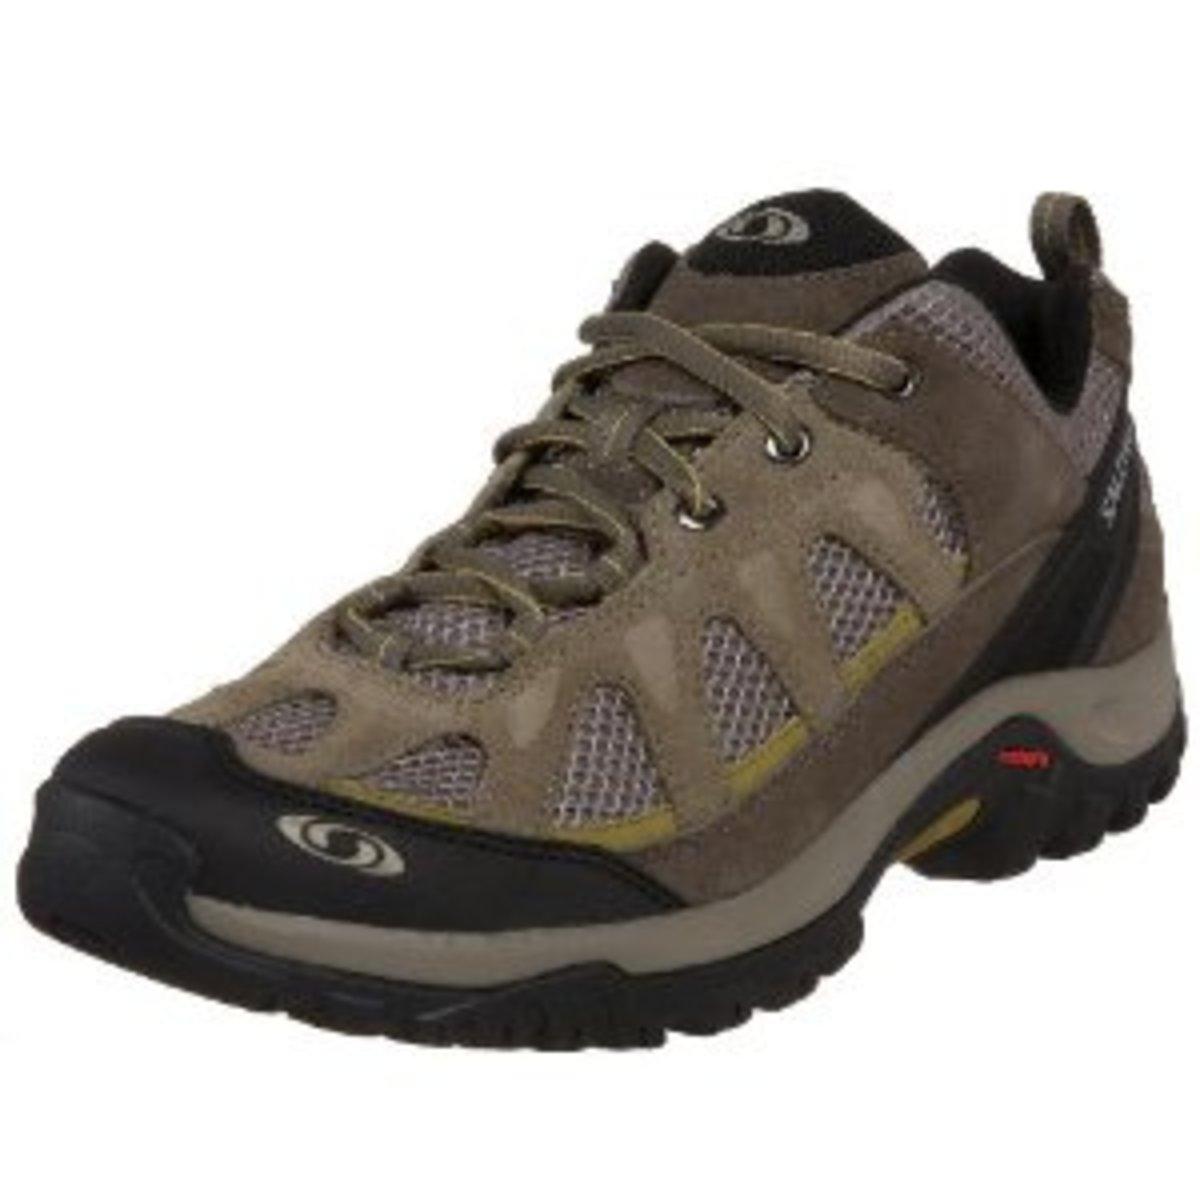 Salomon Men's Exit Aero Hiking Shoe